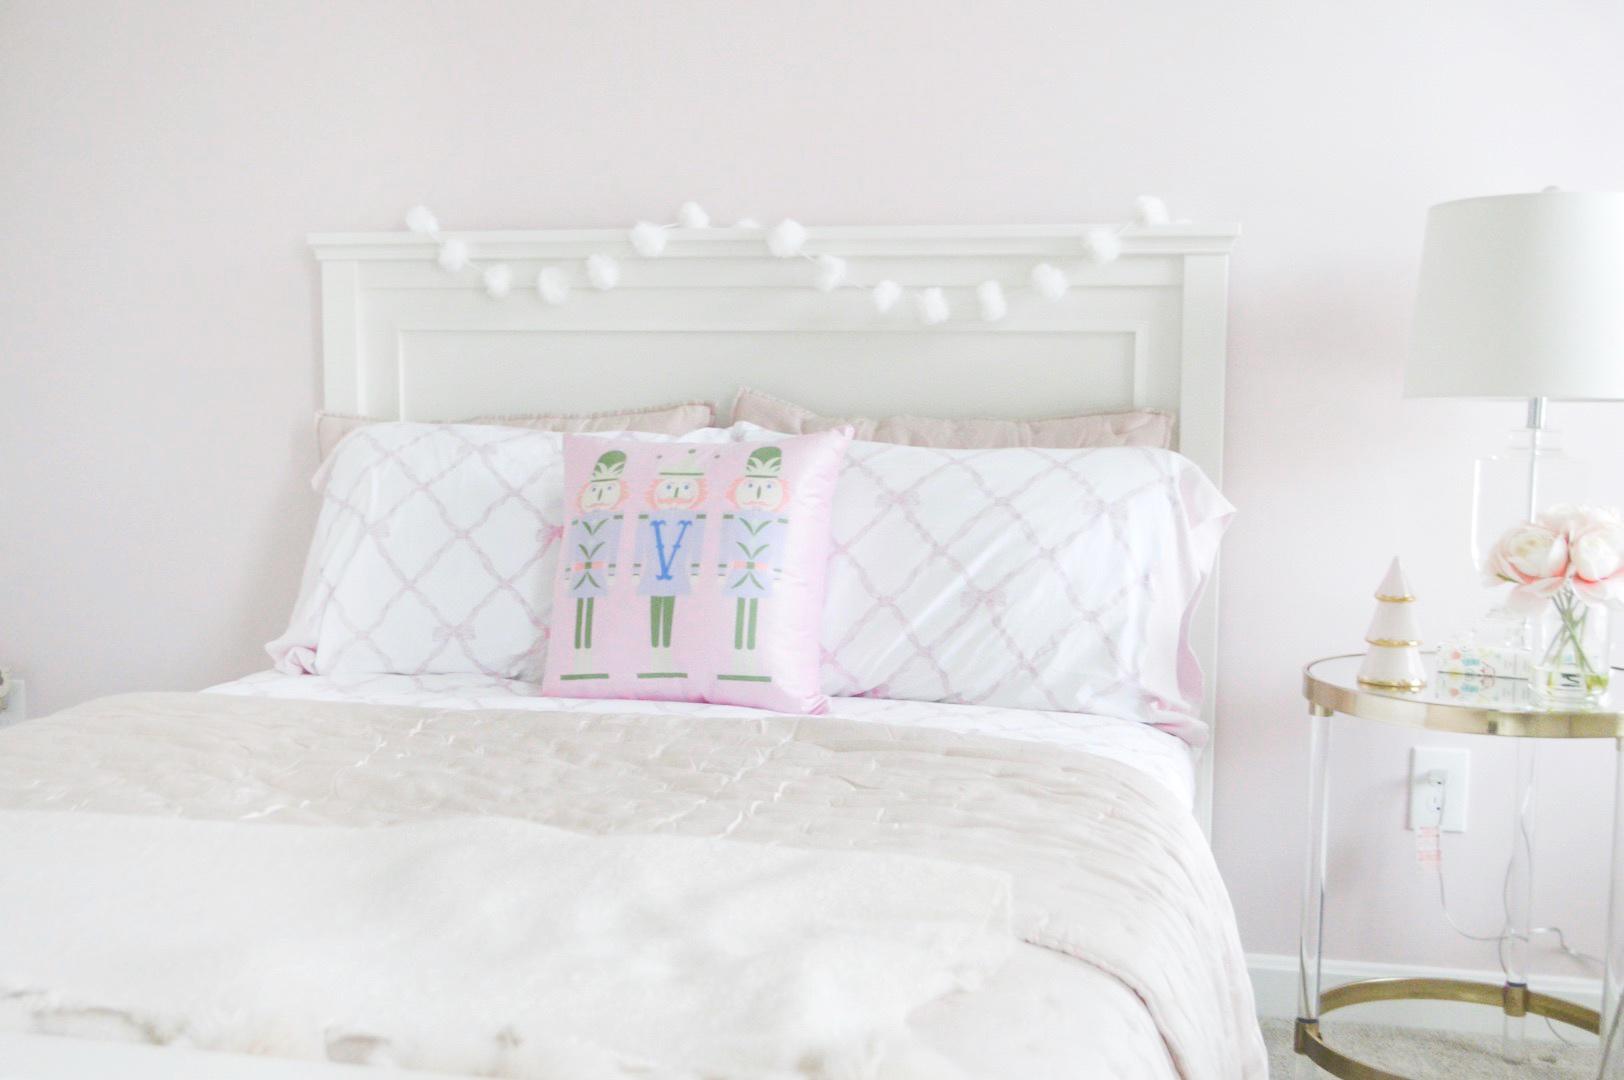 pink and white nutcracker decor